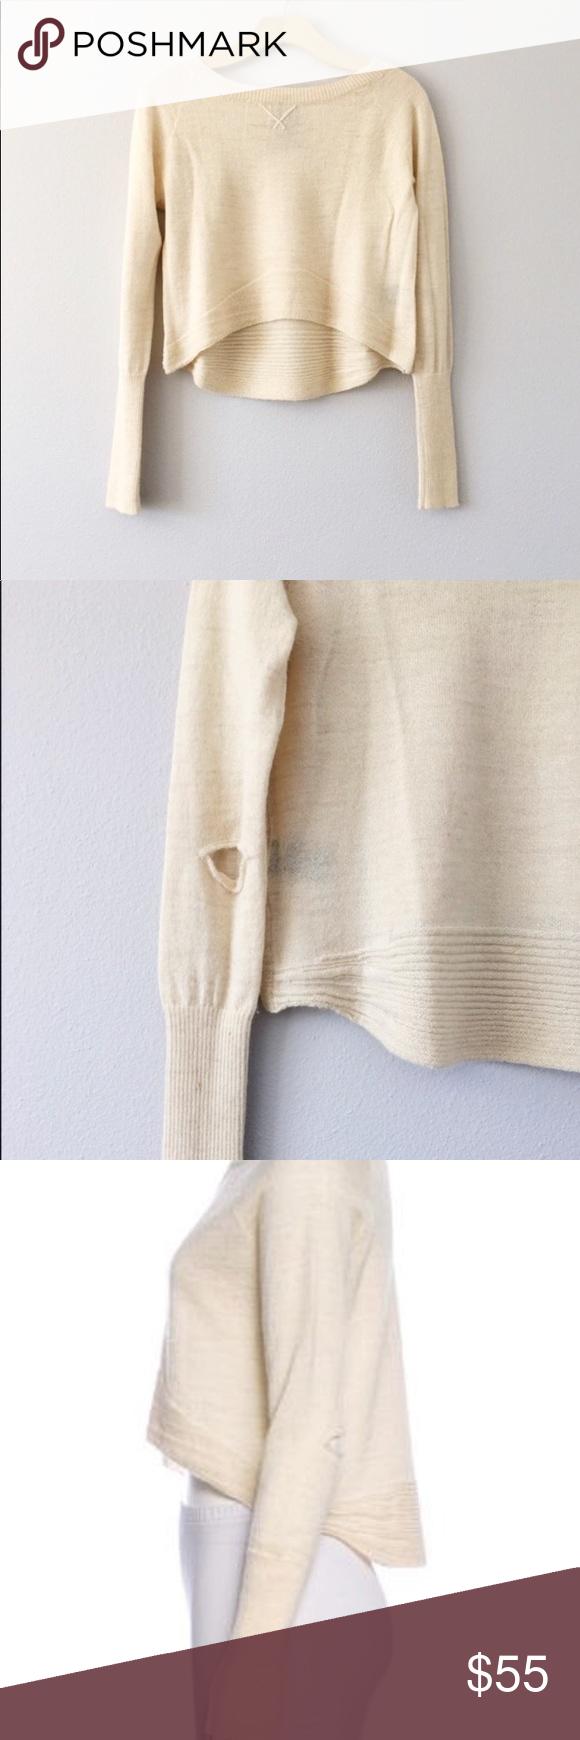 bc12e7d5c Dolce Vita Baby Alpaca Cream Cropped Sweater. SS1